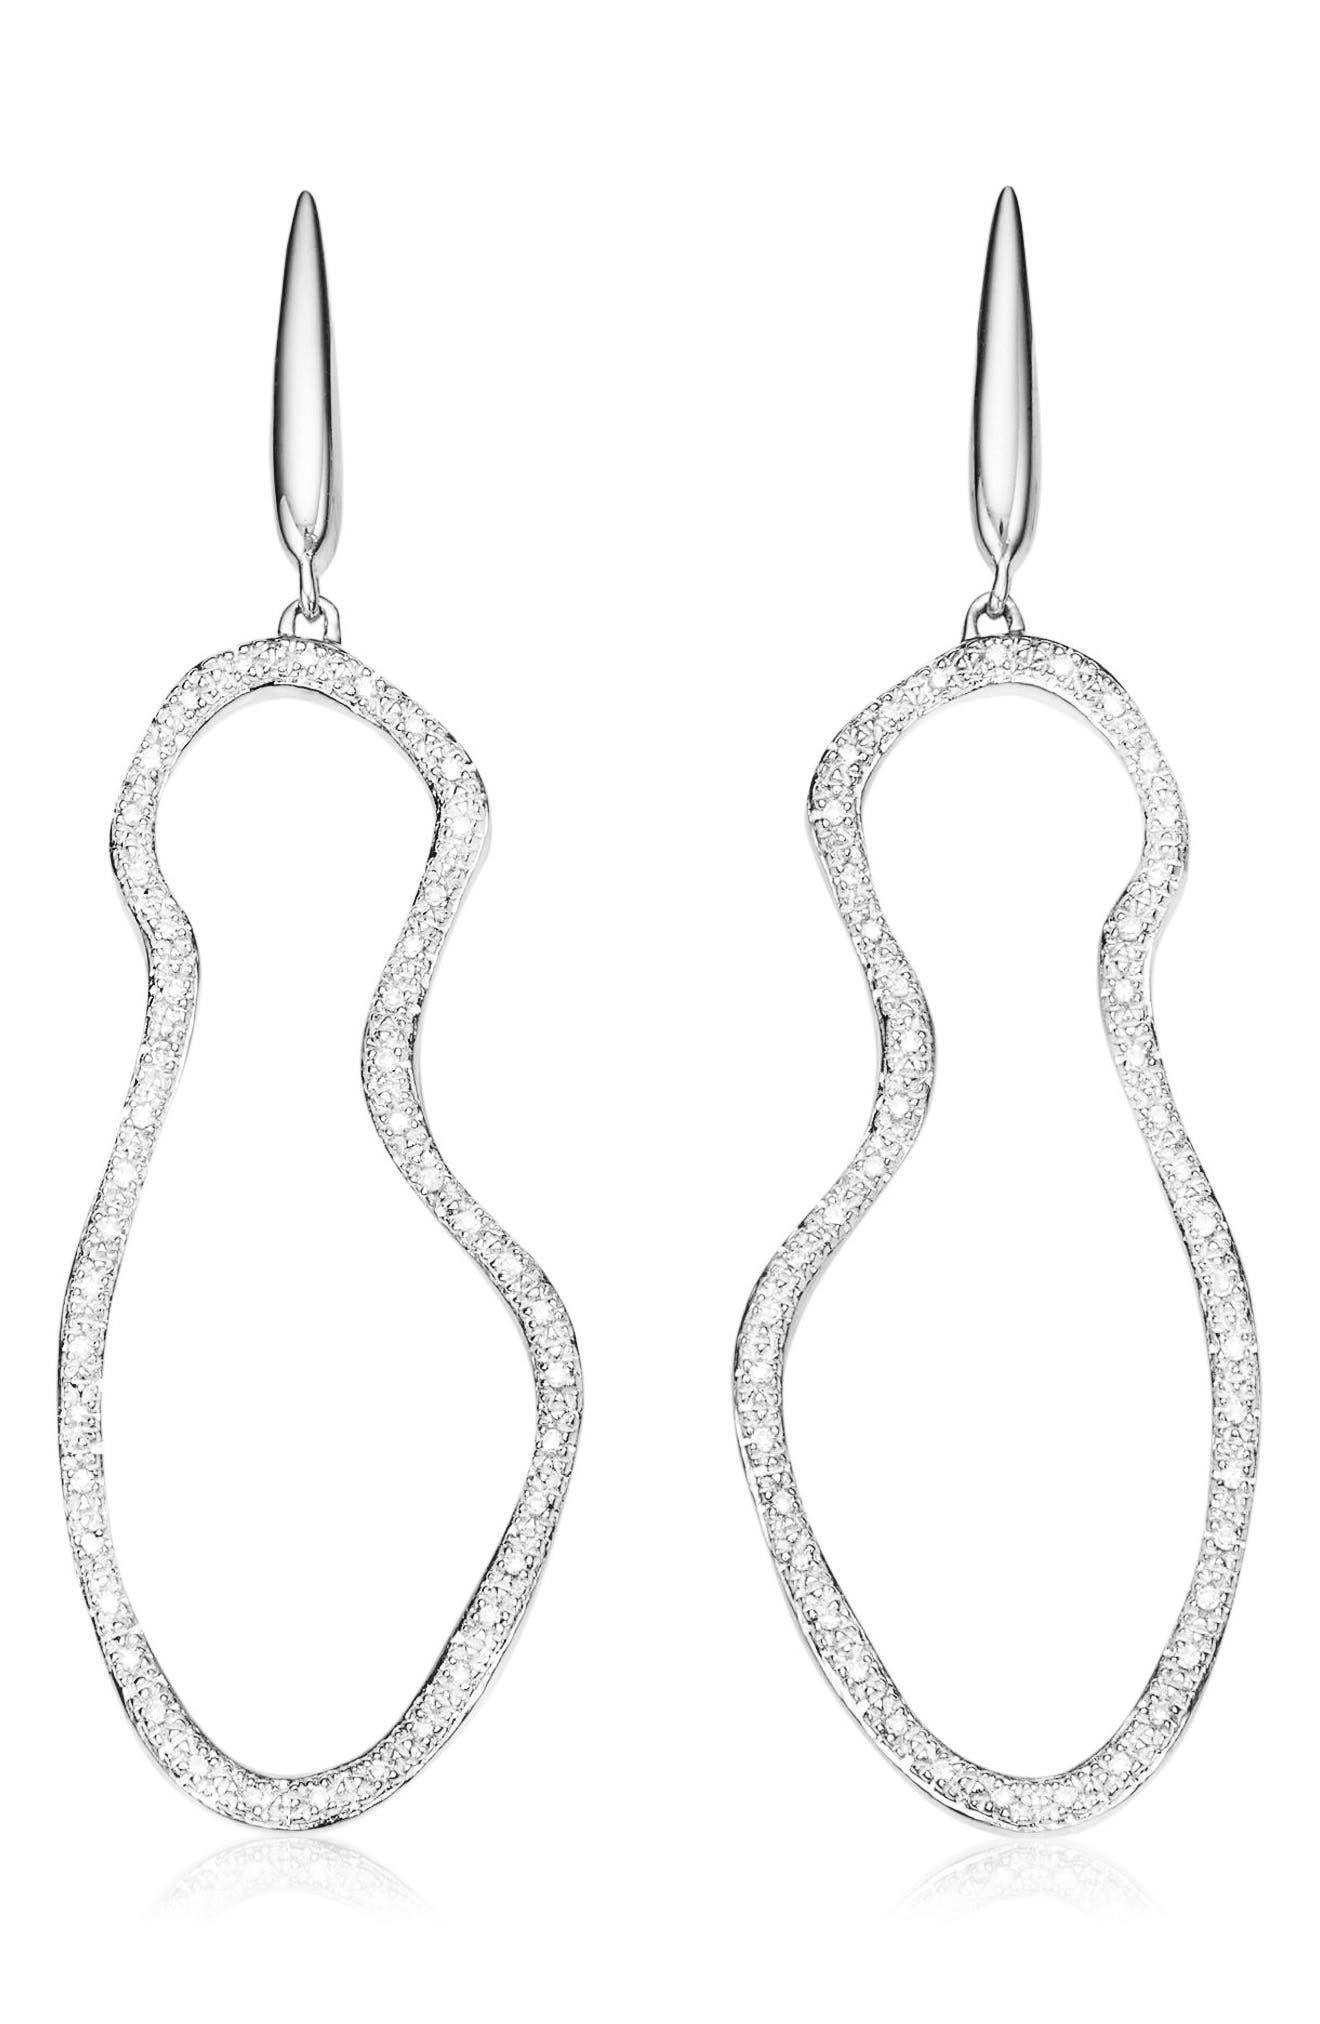 Riva Pod Diamond Cocktail Earrings,                             Main thumbnail 1, color,                             045